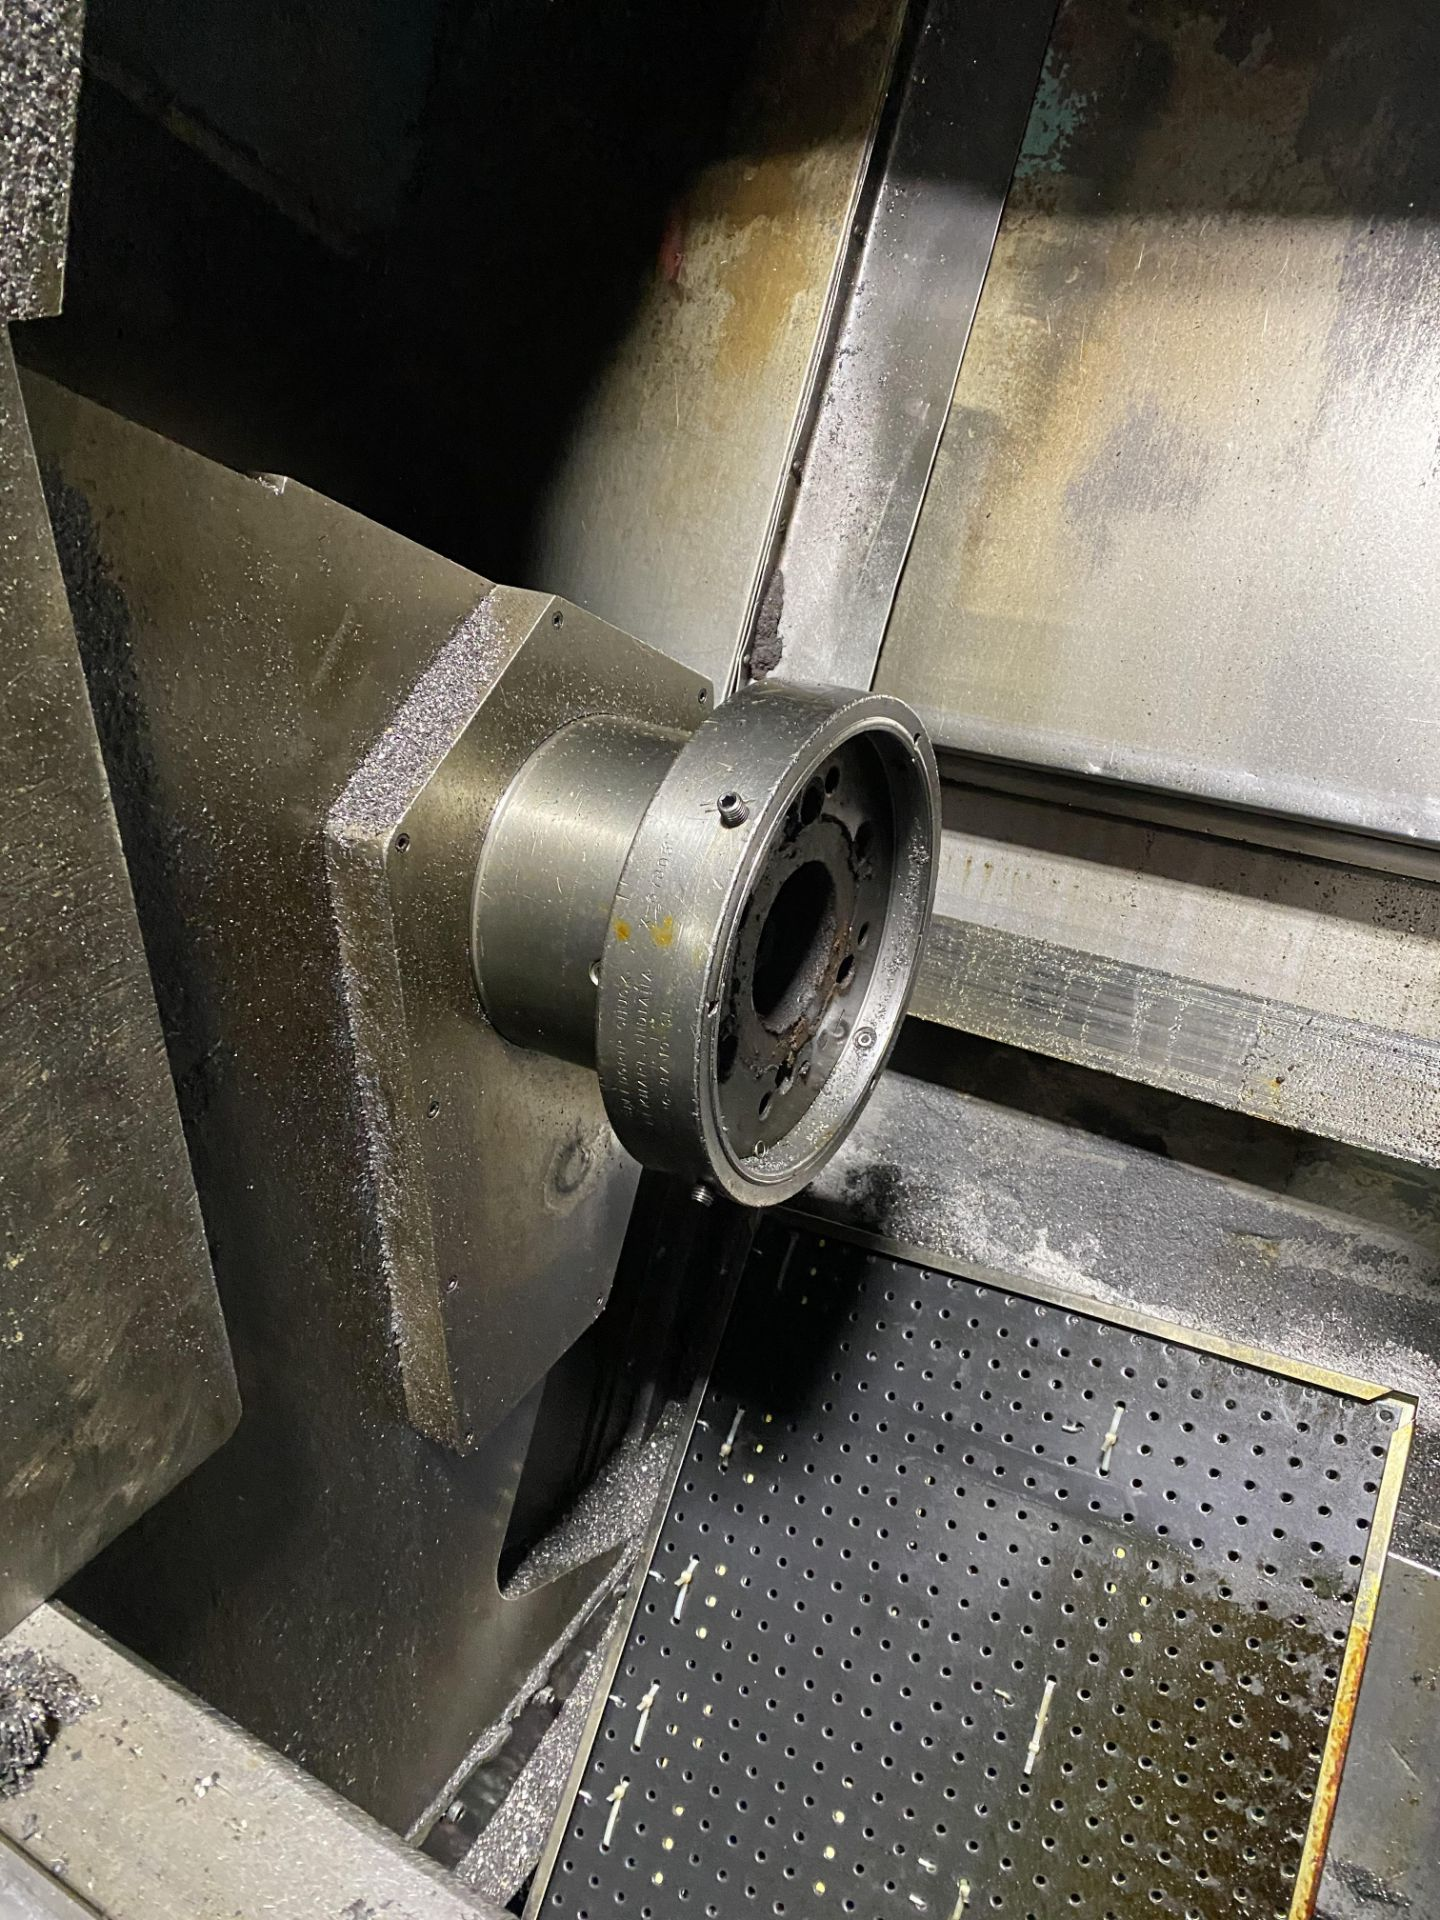 Cincinnati Cinturn 12 CNC Lathe w/ Fanuc Control RETROFIT ***PARTS MACHINE, NO CONTROLLER** - Image 2 of 8